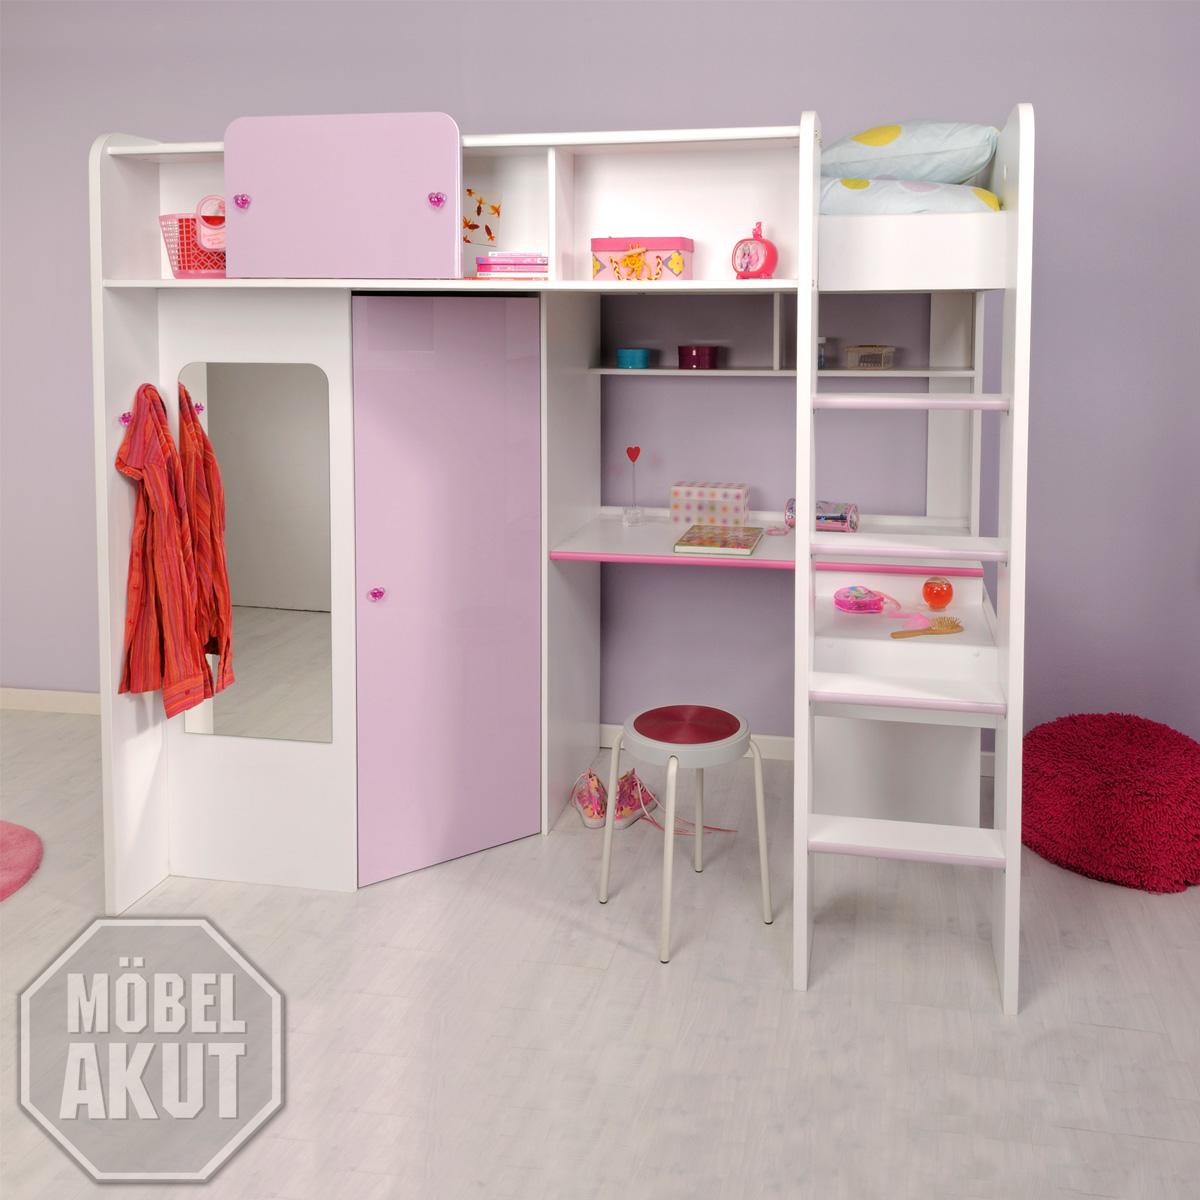 hochbett madame etagenbett wei lila hochglanz ebay. Black Bedroom Furniture Sets. Home Design Ideas